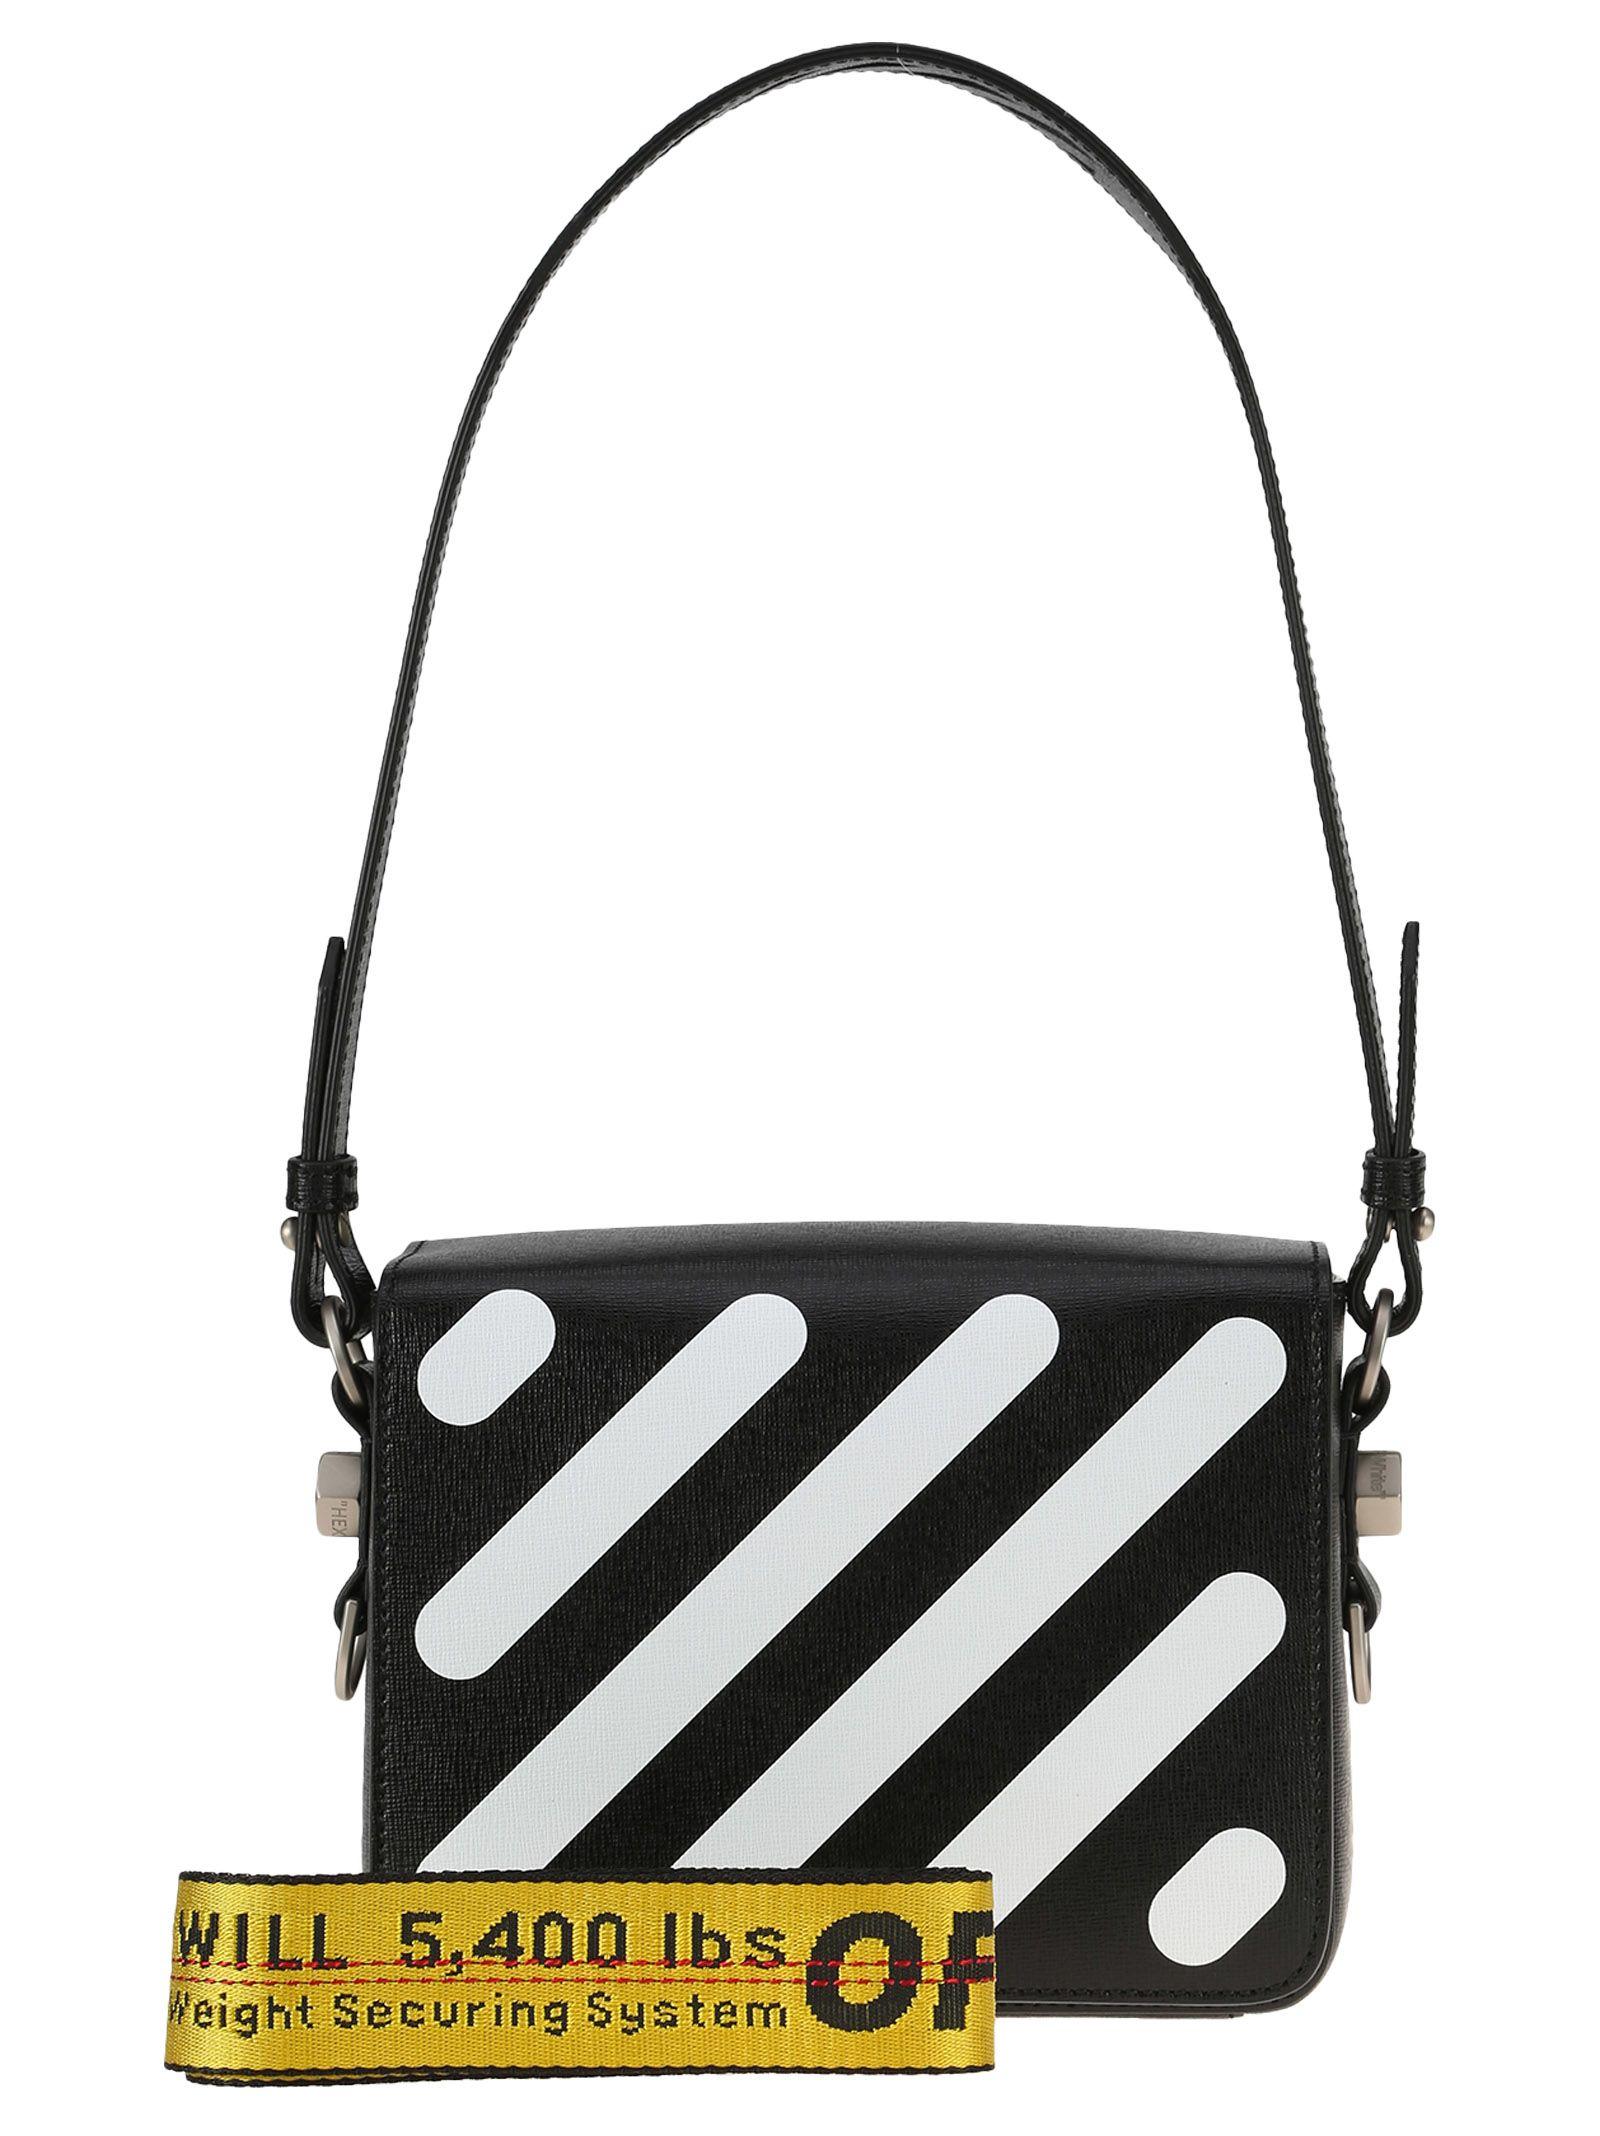 64d45d44b0 Off-White White Diagonal Flap Leather Shoulder Bag In Black + White Stripes